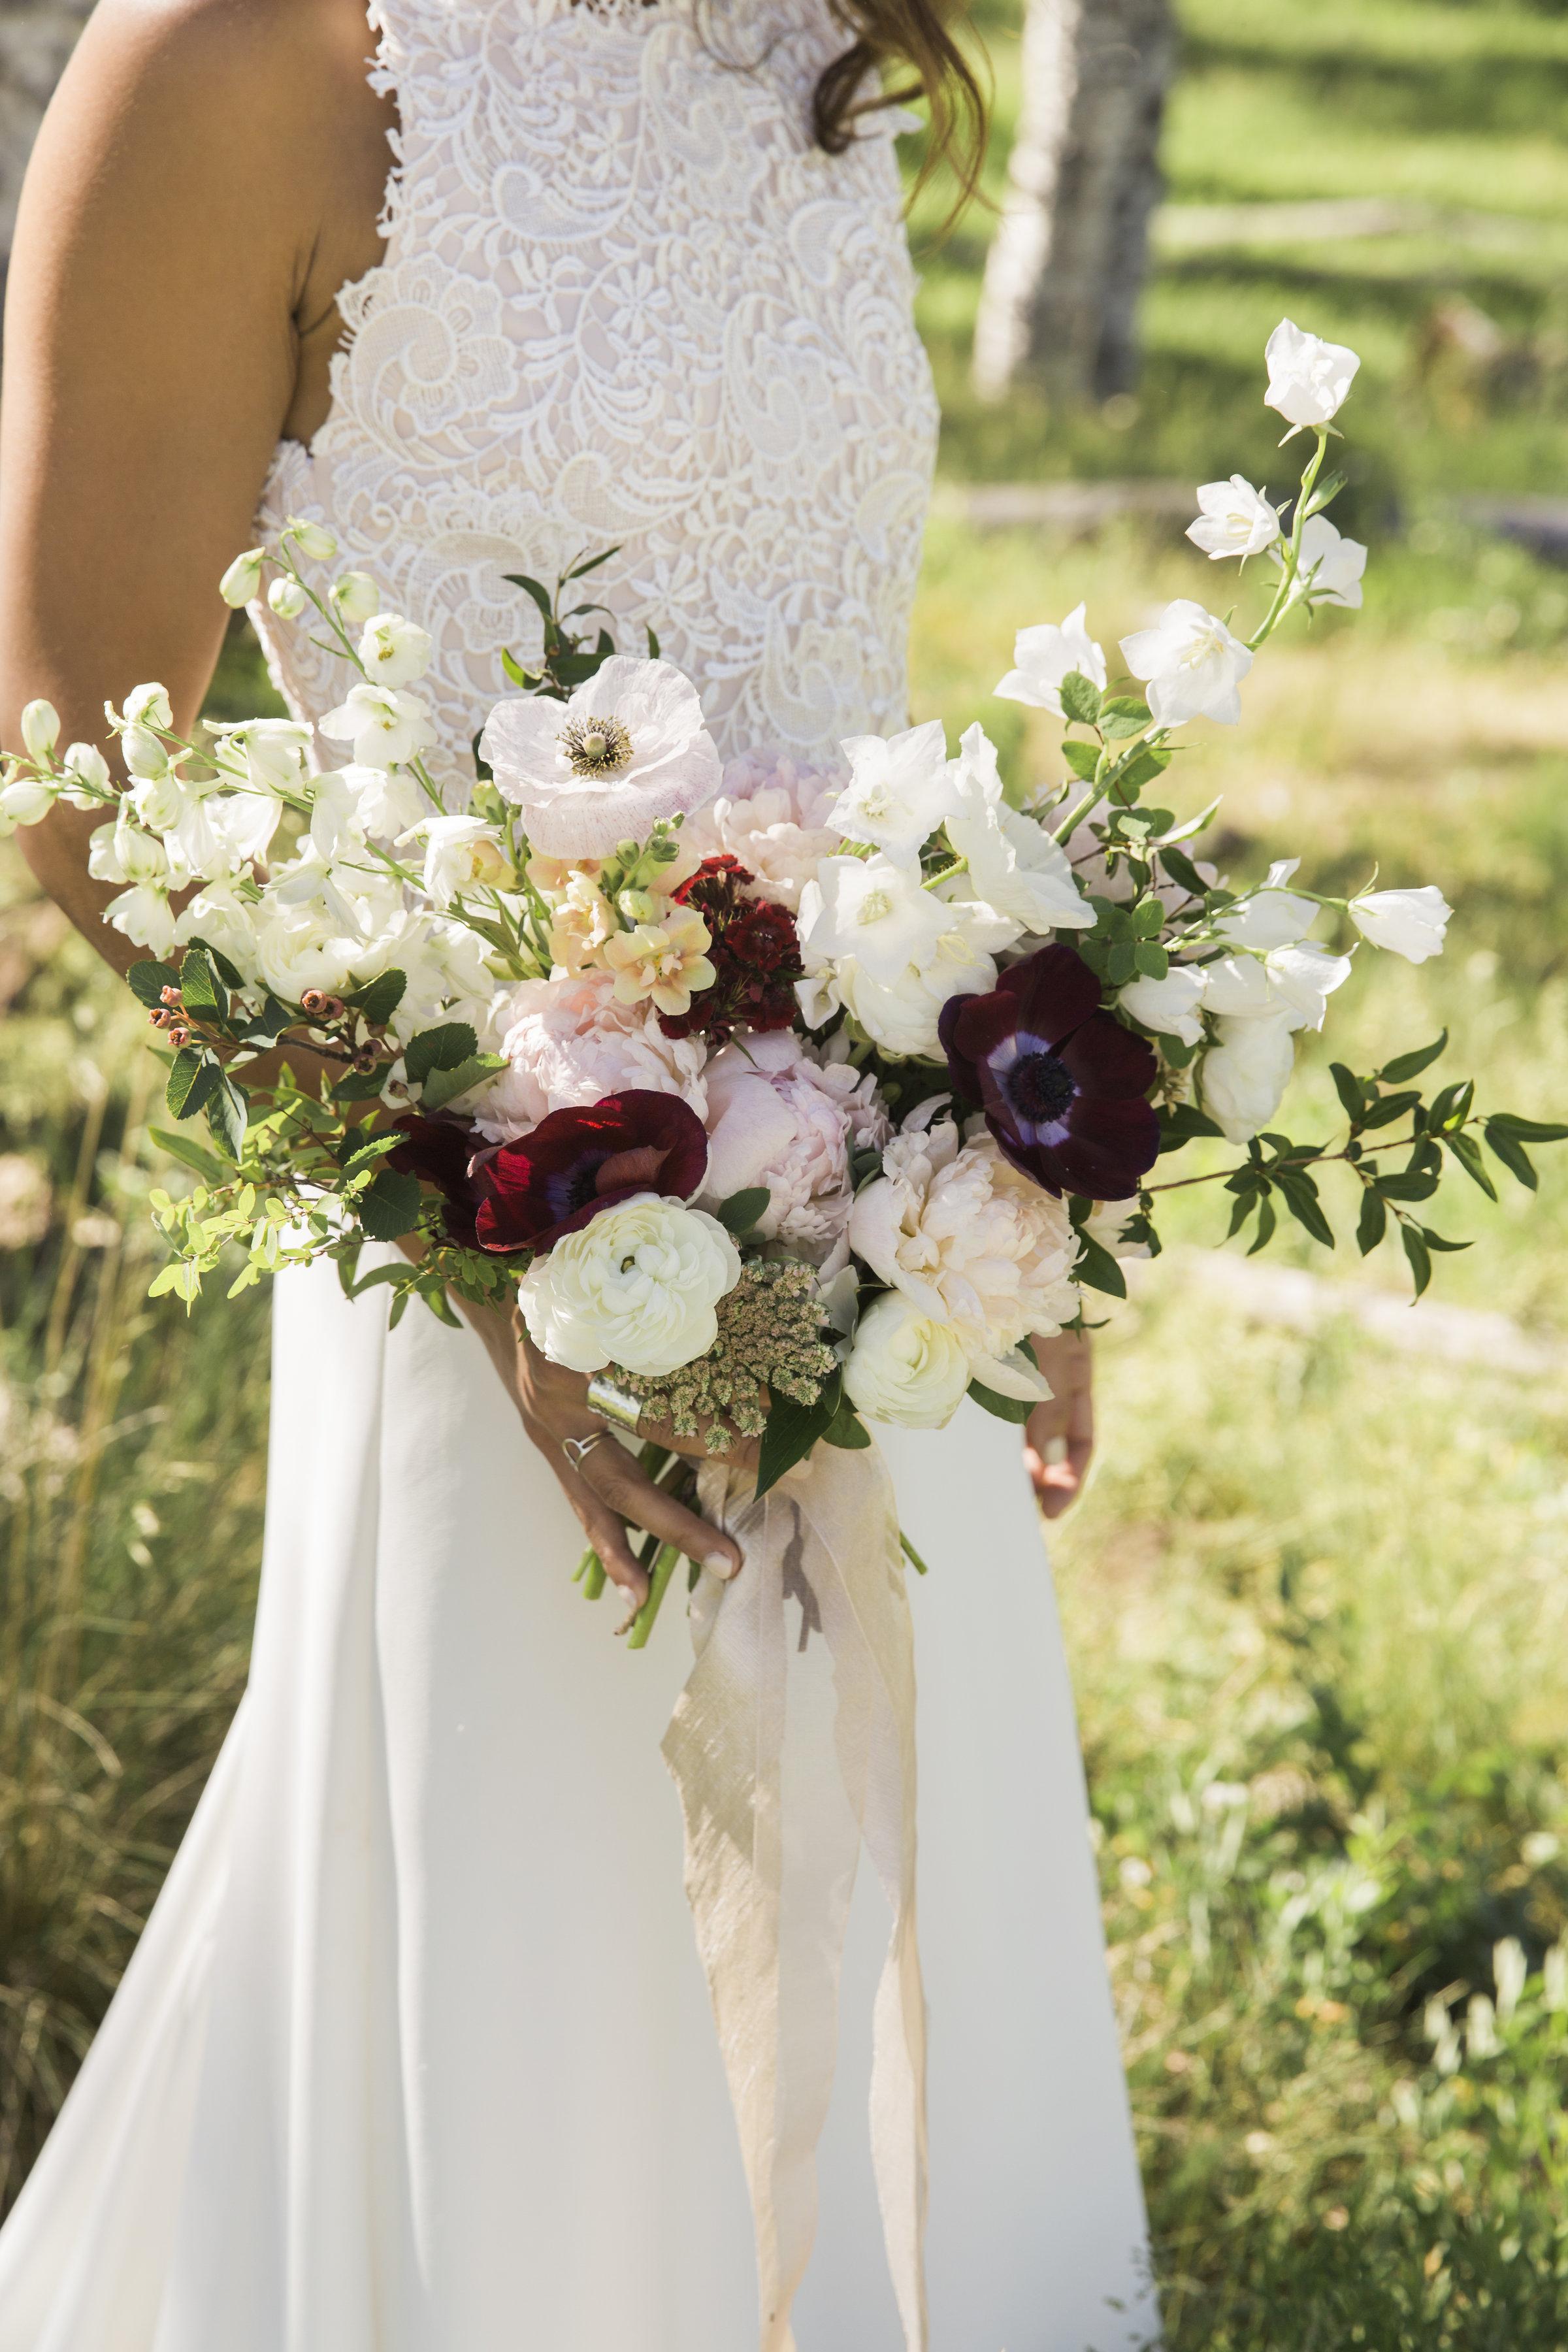 258-Karissa-Shockey-wedding-selects.jpg